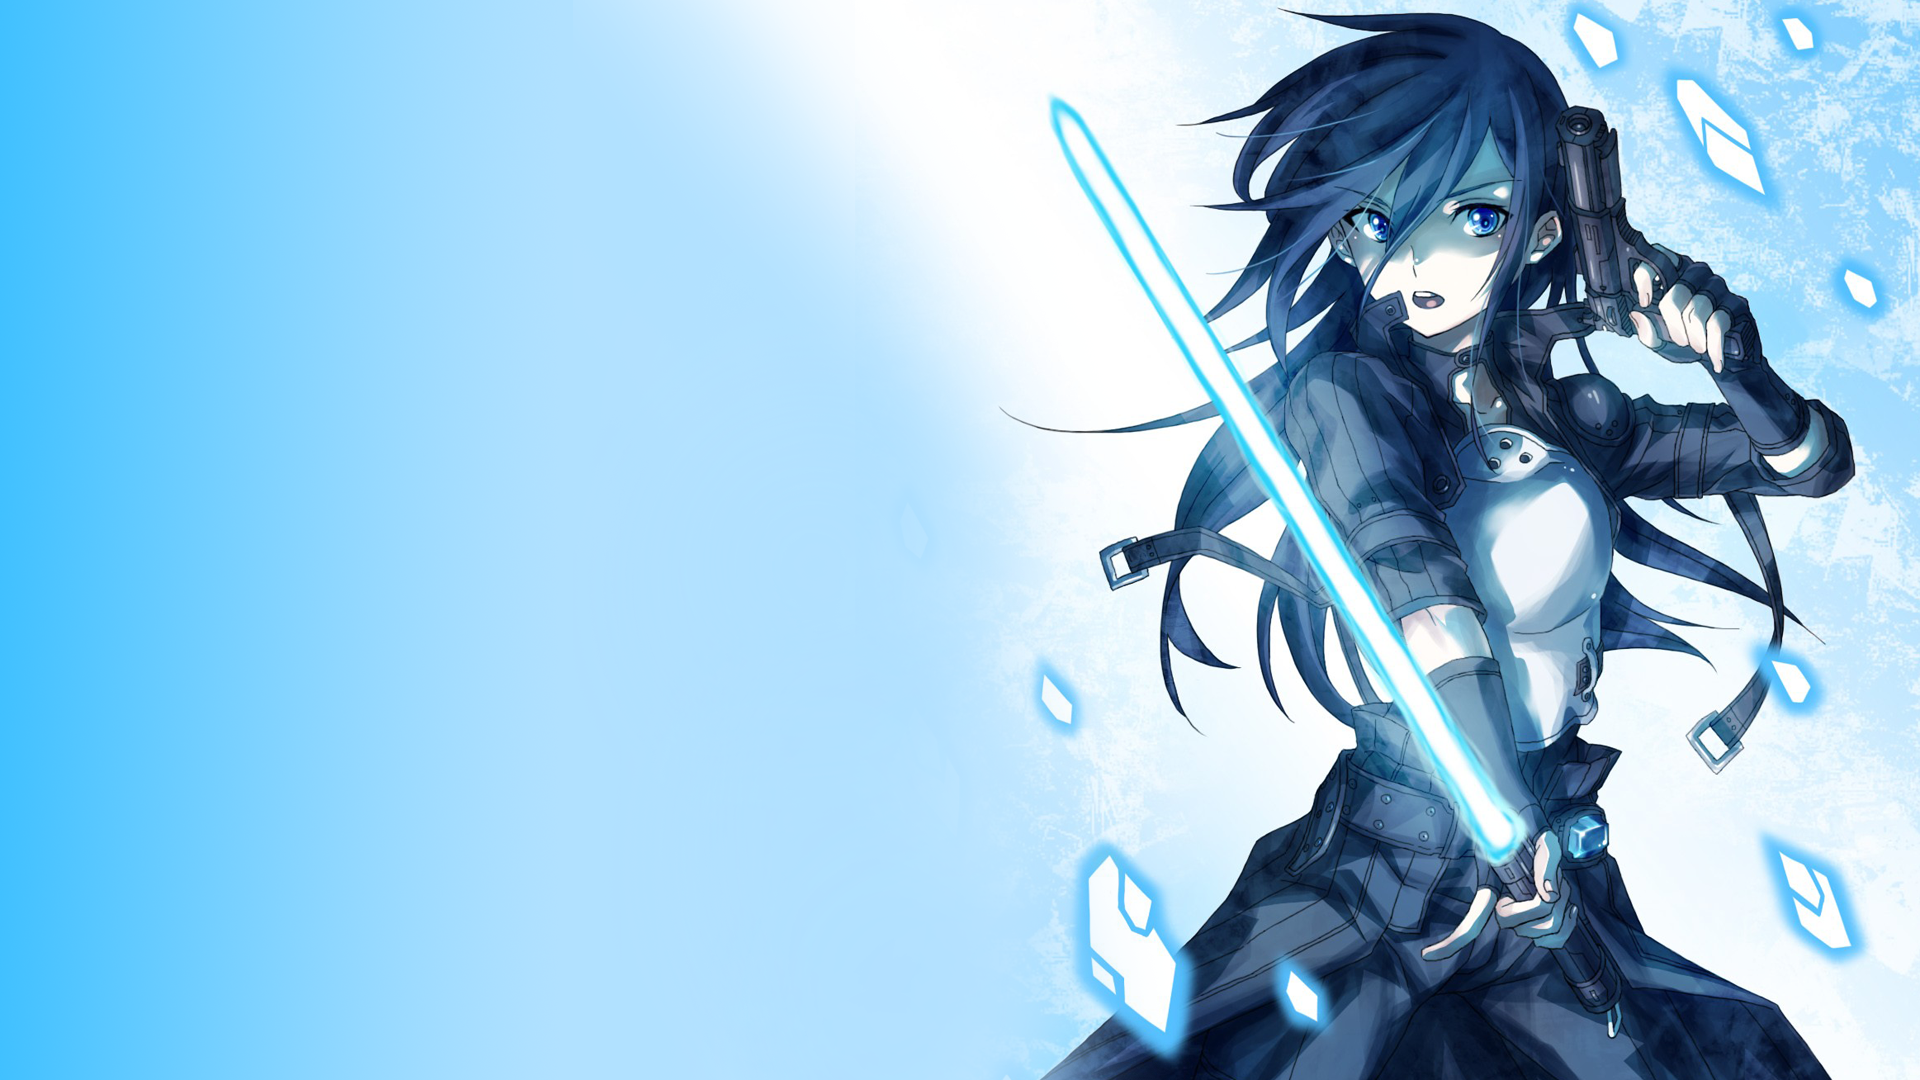 Anime Female Holding A Gun And Lightsaber